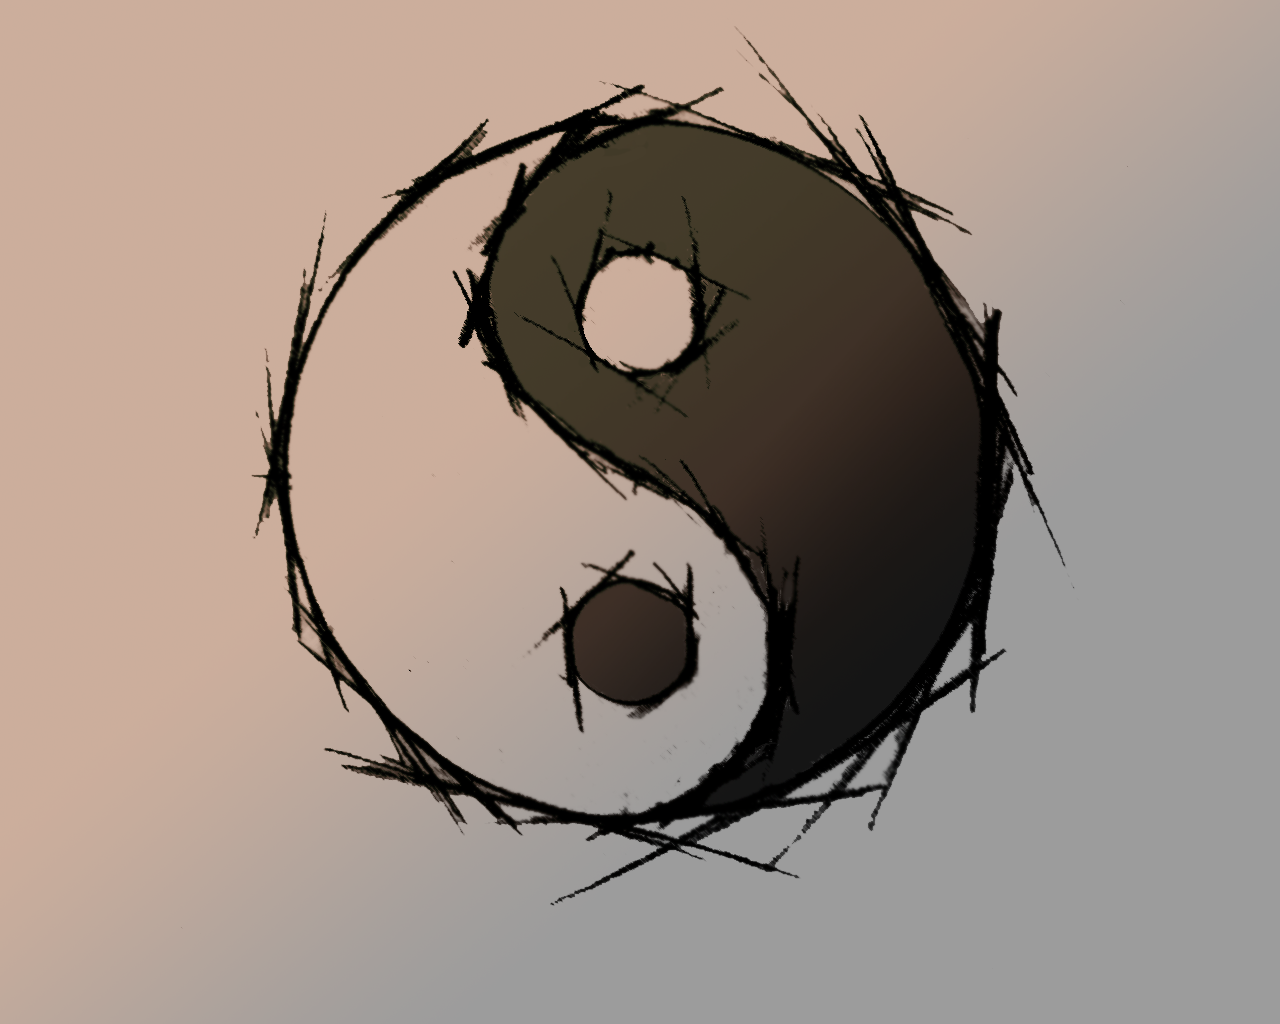 Ying yang wallpaper by woochoo on deviantart - Yin and yang wallpaper ...